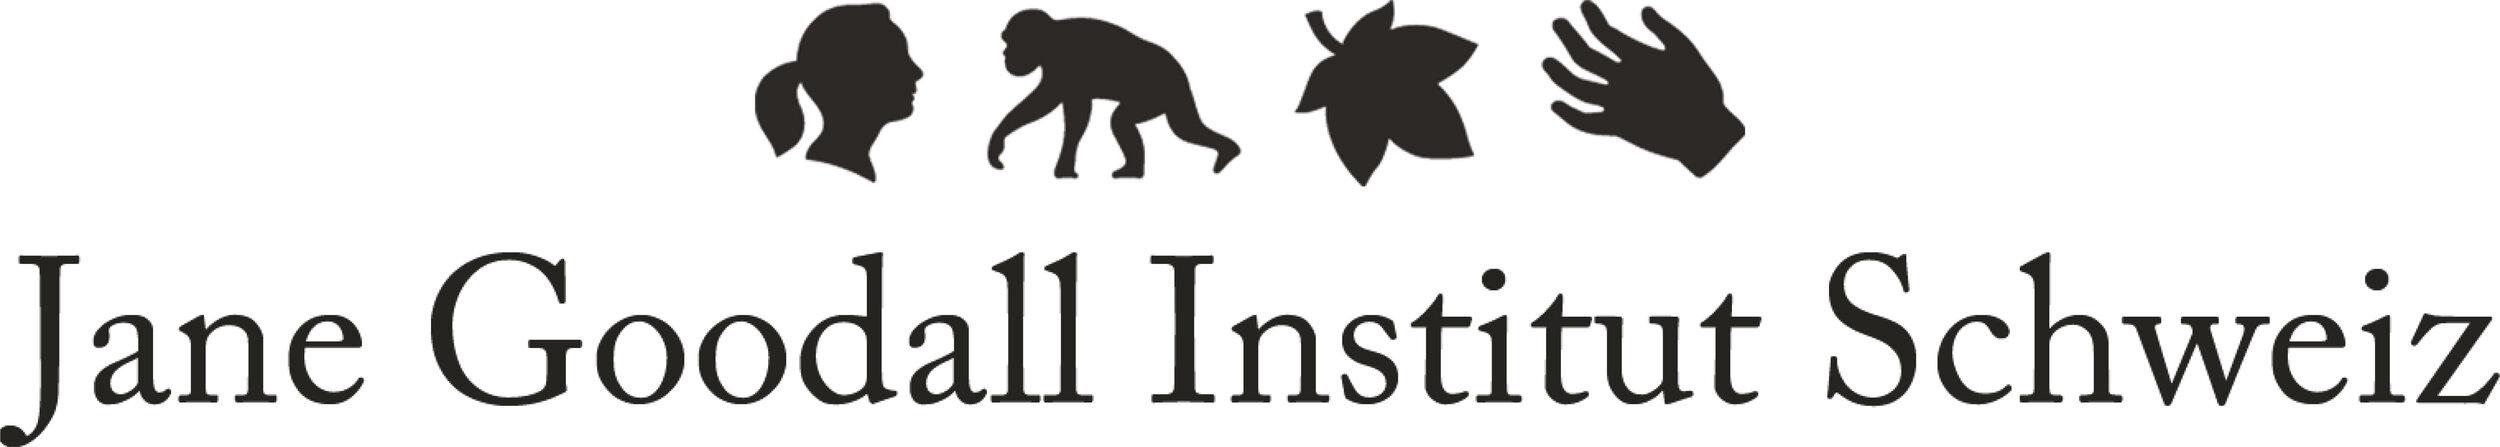 LogoJane2Test.jpg